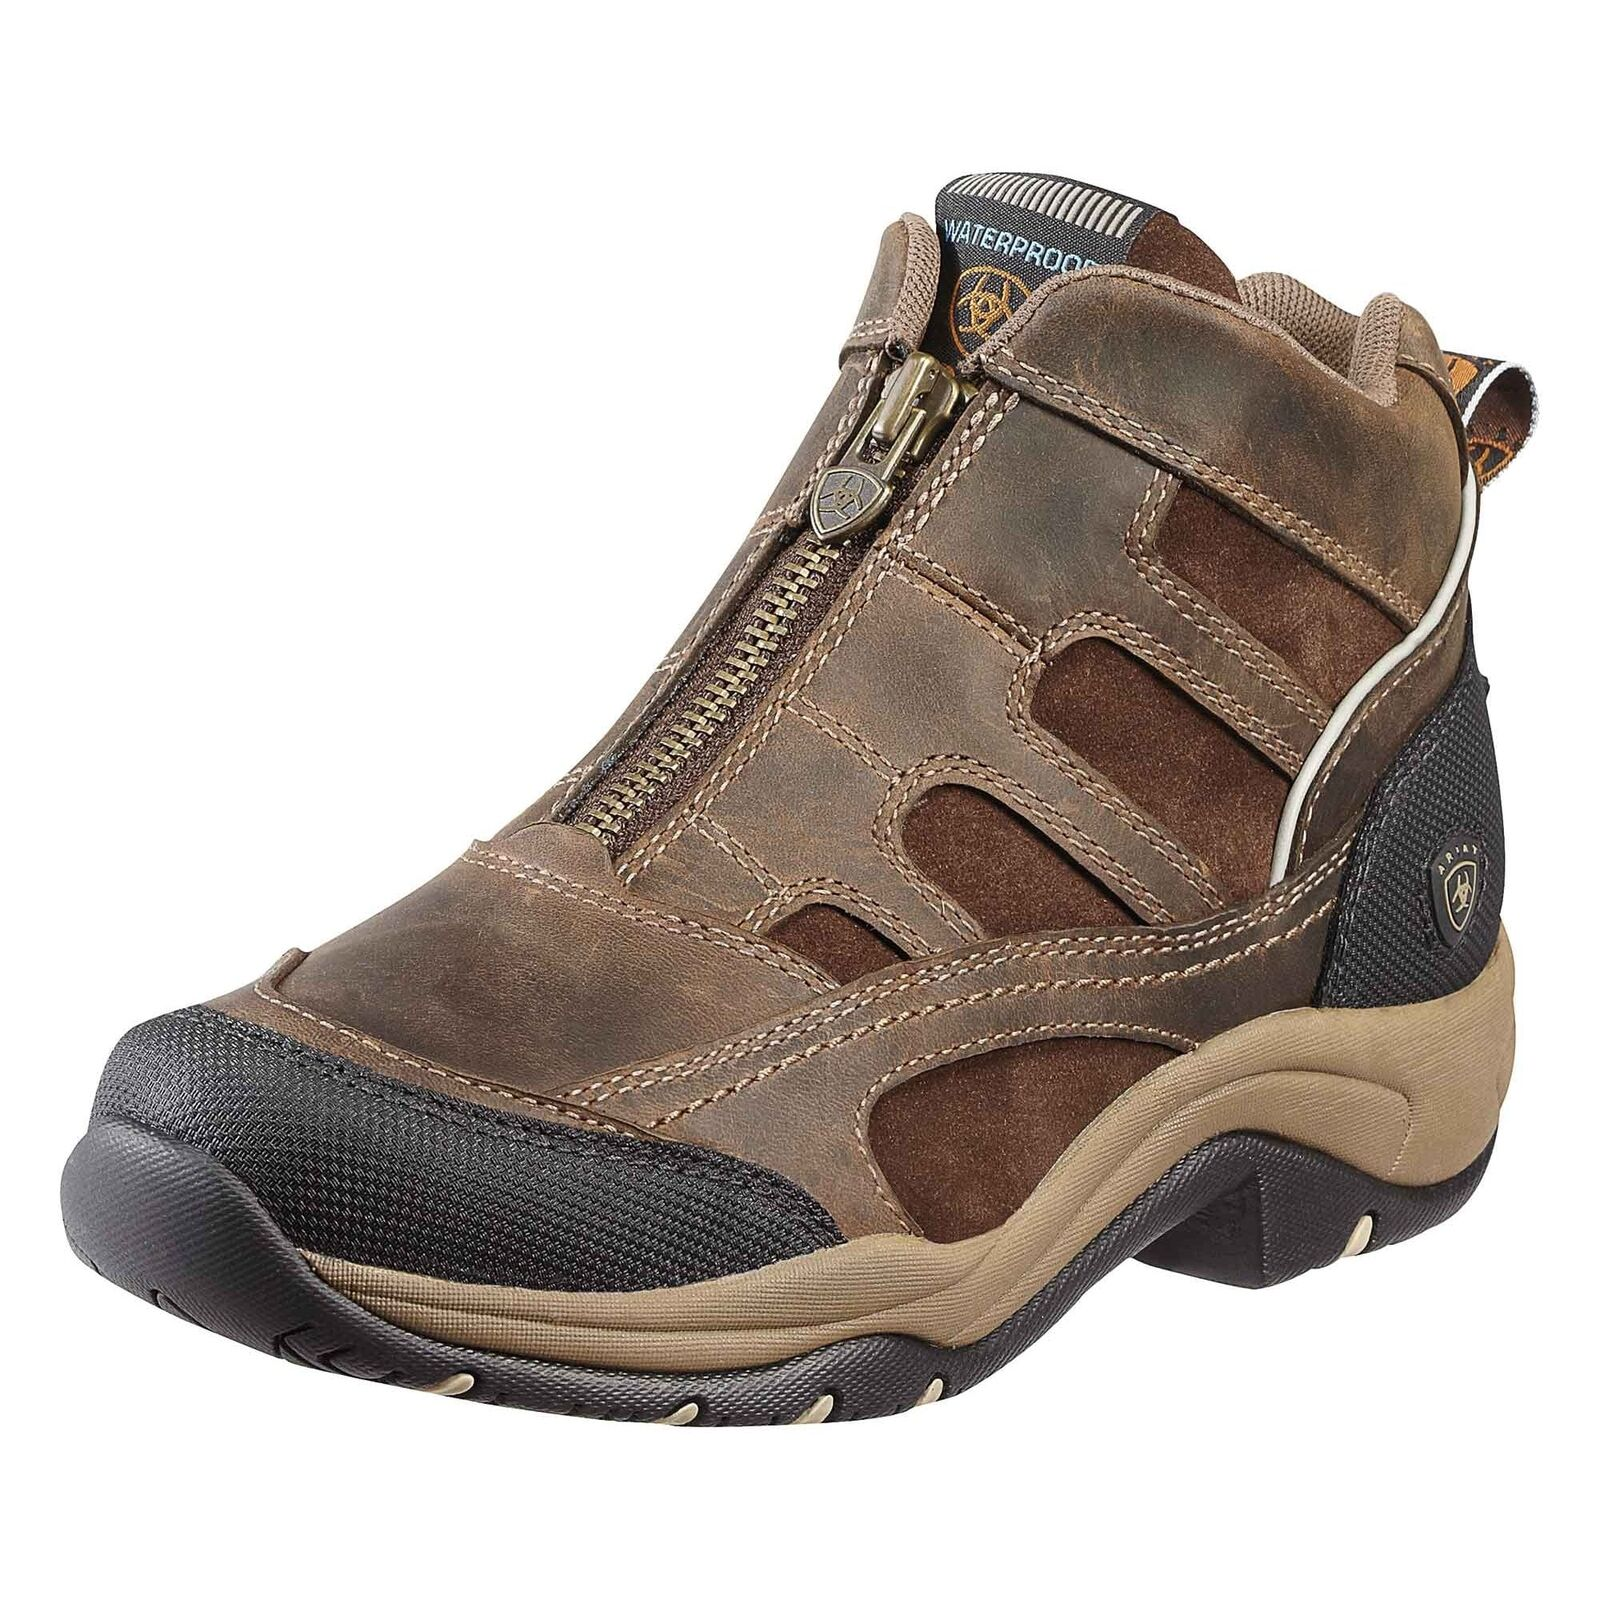 Ariat Terrain Zip H2O Boots Distressed Brown UK EU SIZES